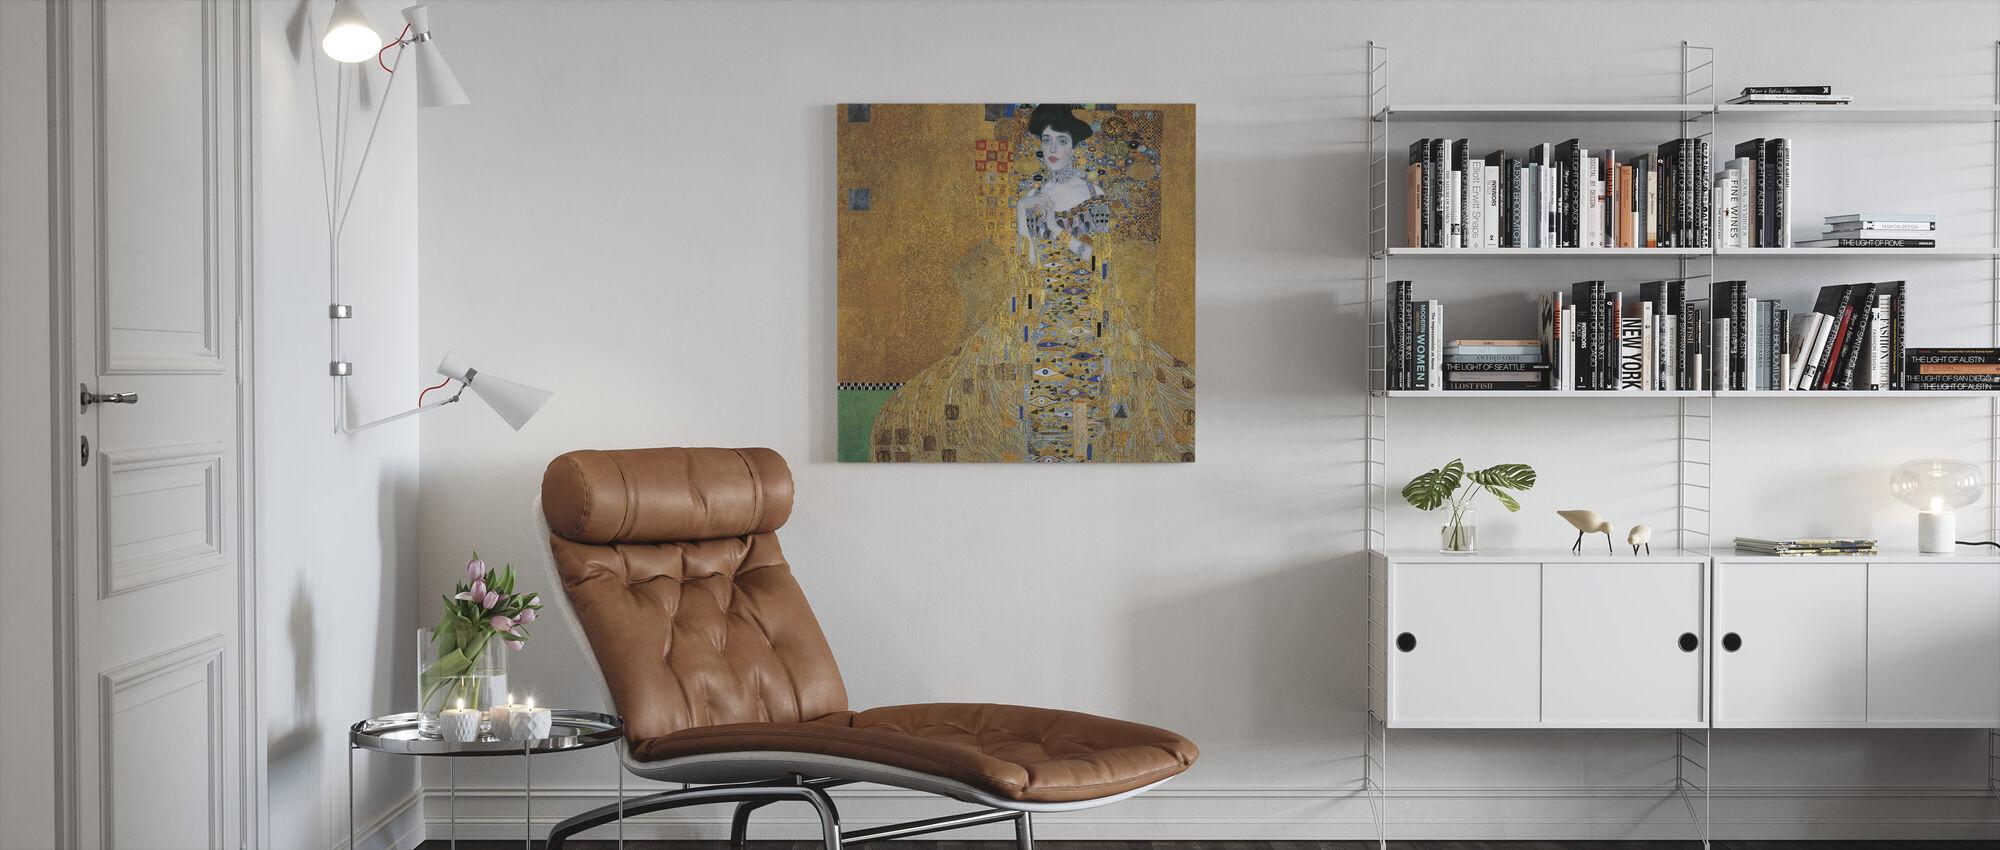 Klimt, Gustav - Adele Bloch-Bauer I - Canvas print - Living Room